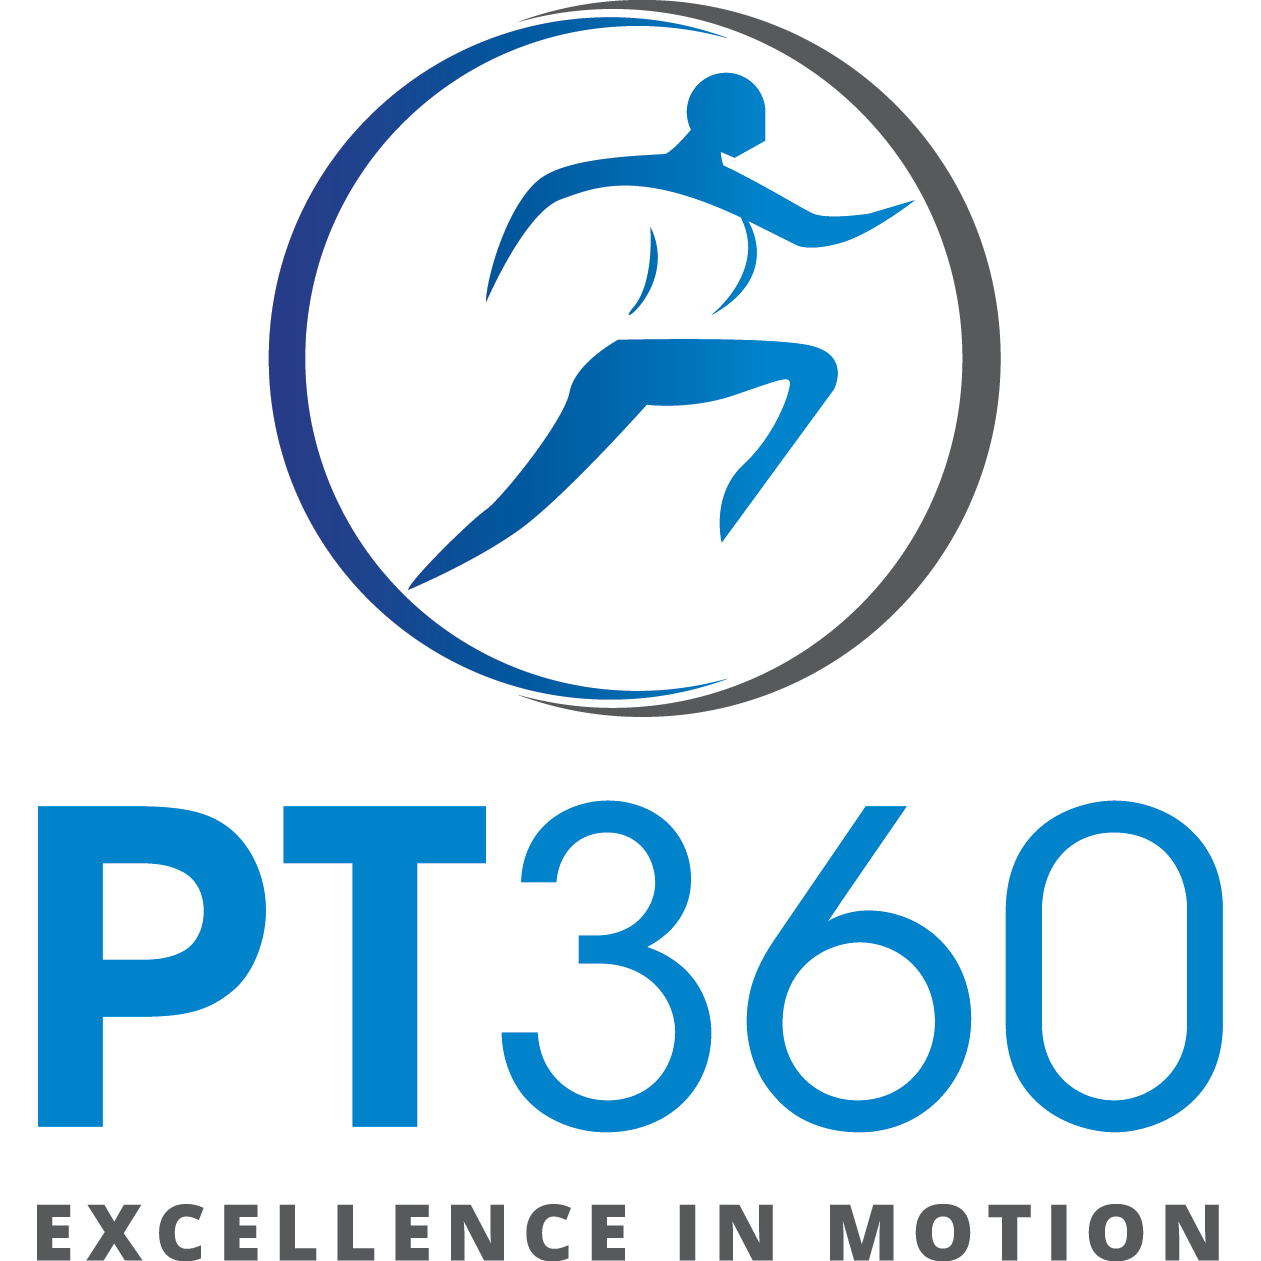 PT 360